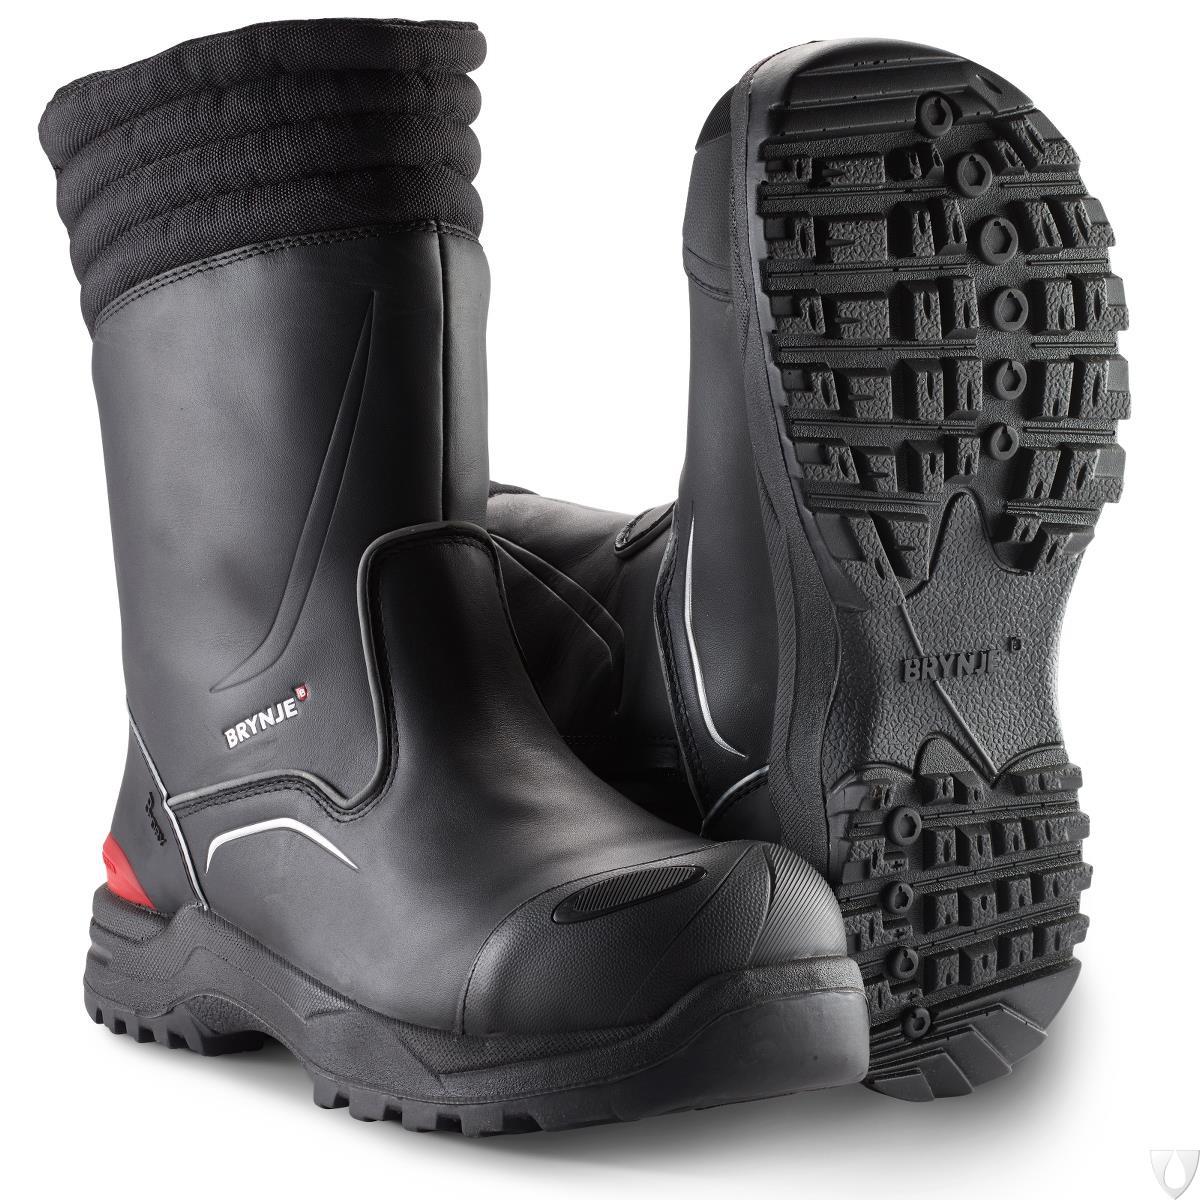 Brynje 484 B Dry Boot S3 SRC